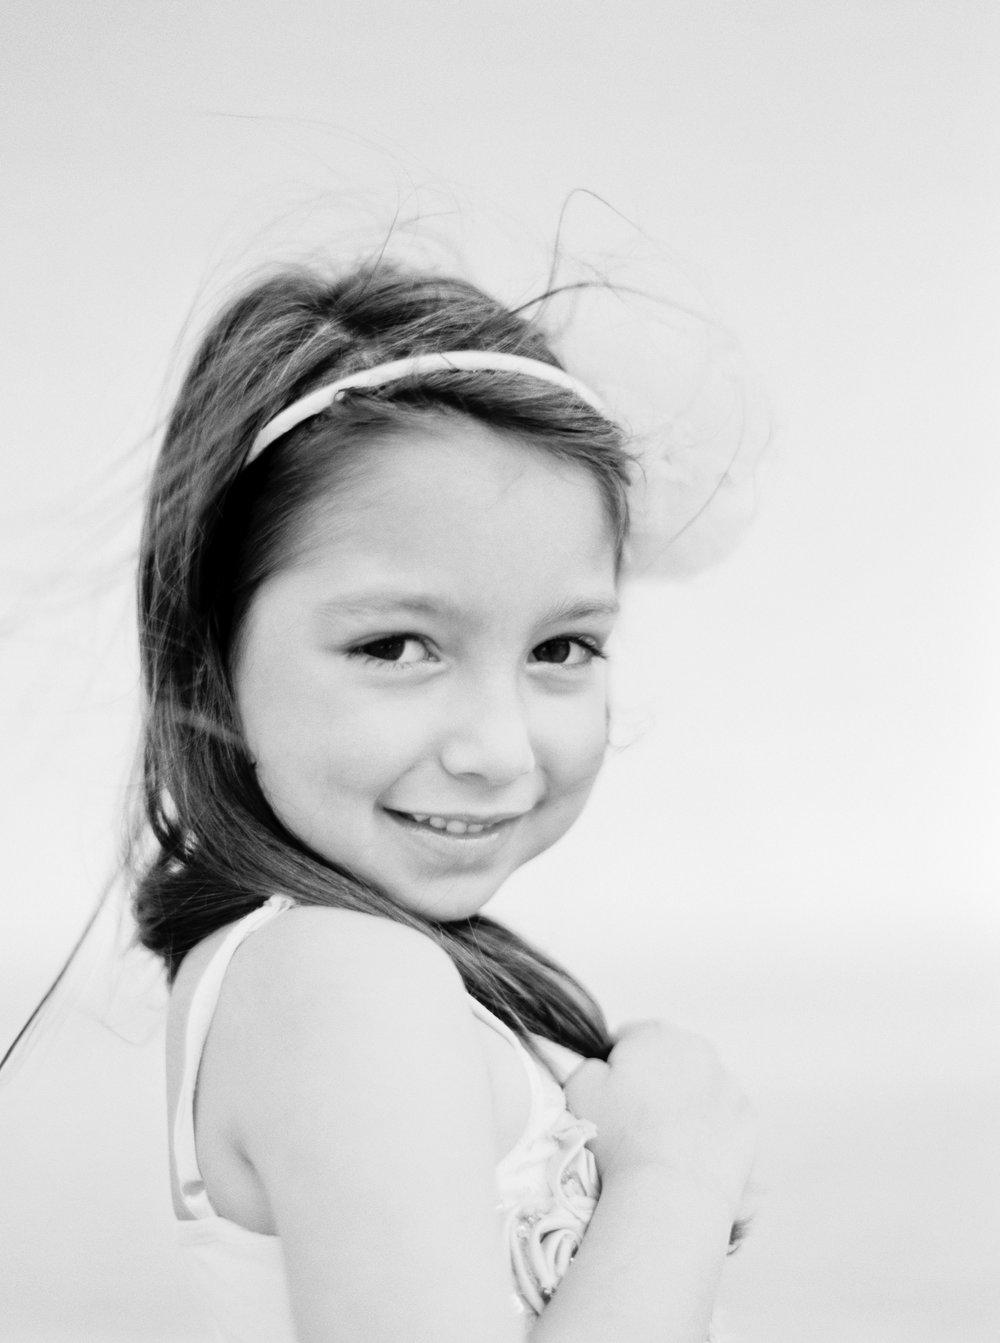 Michelle-March-Photography-K2017-20.jpg